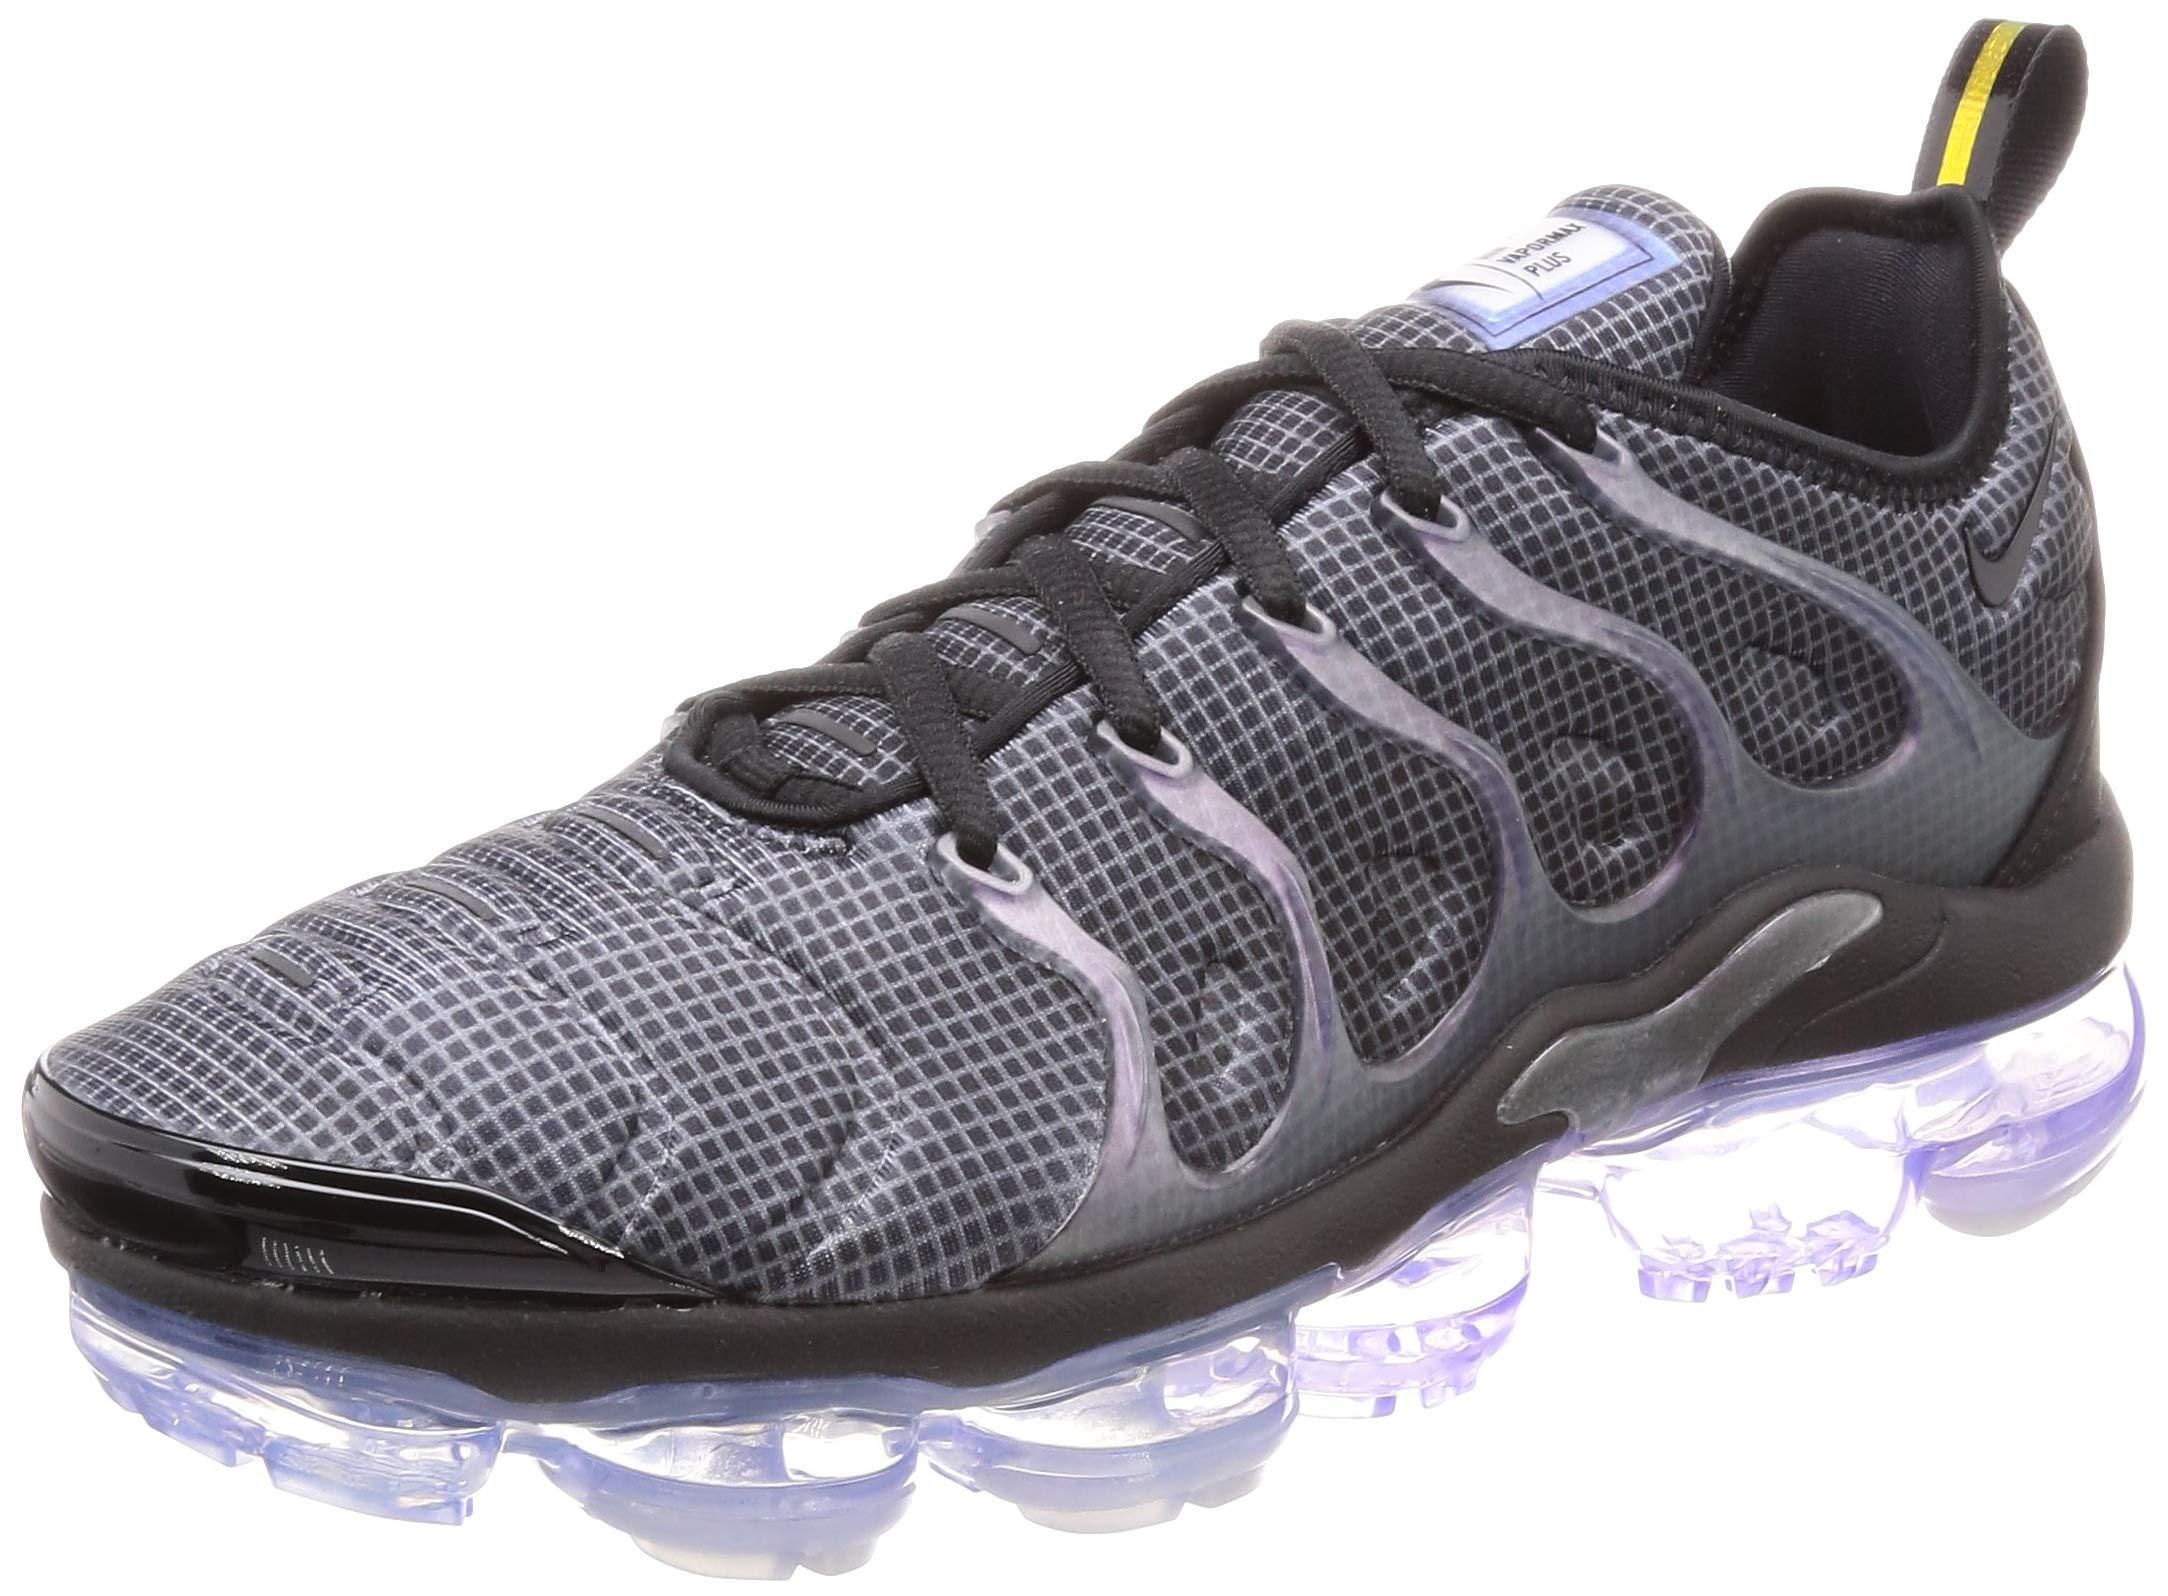 best sneakers 5b5d9 c8524 Amazon Cambodia , Shopping on amazon ship to Cambodia, Ship ...